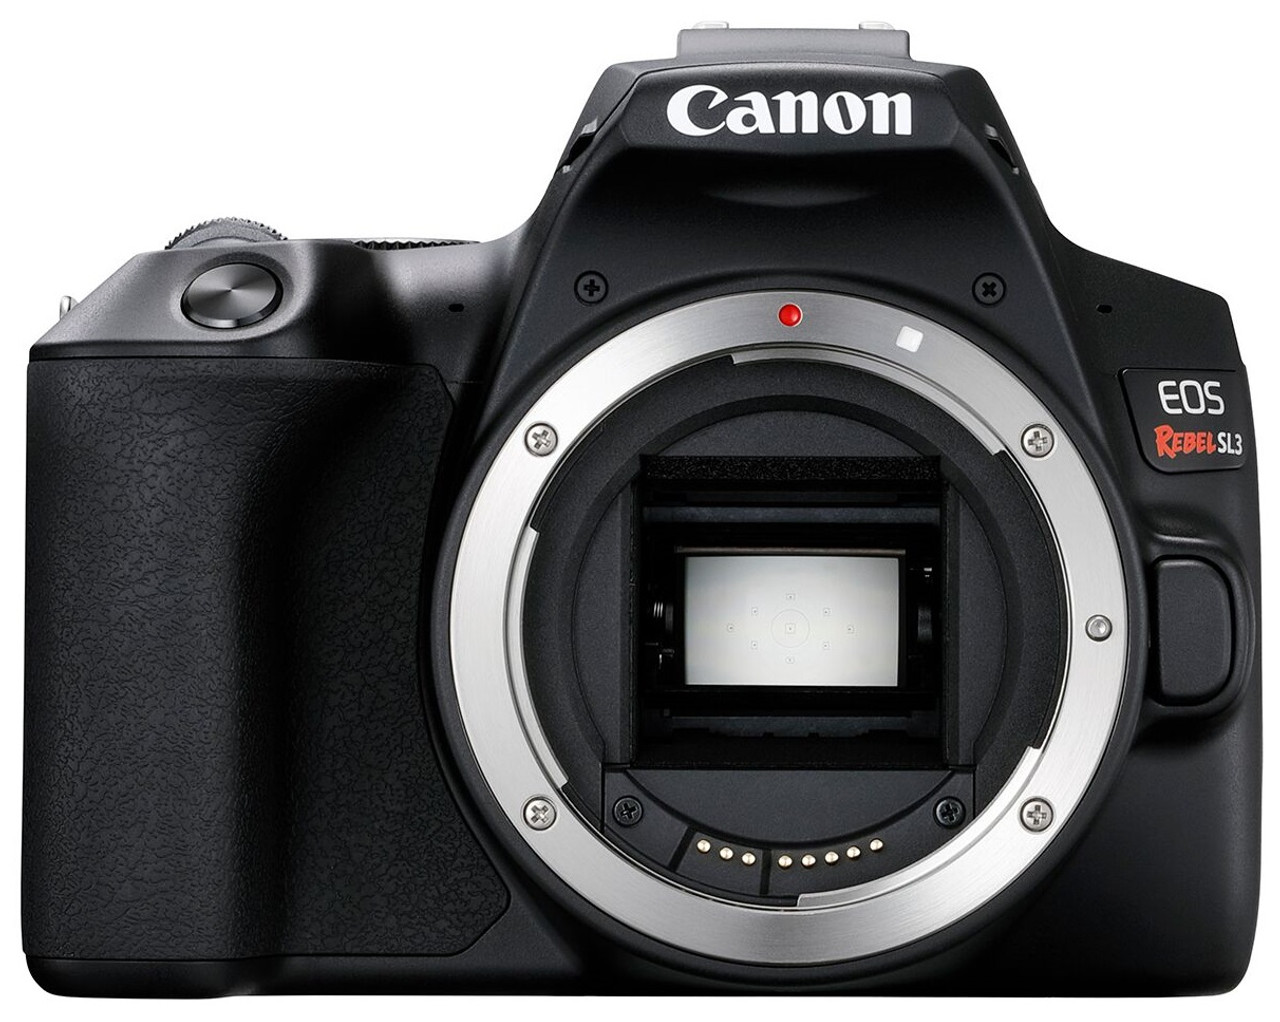 Canon EOS Digital Rebel SL3 DSLR Camera - Body Only